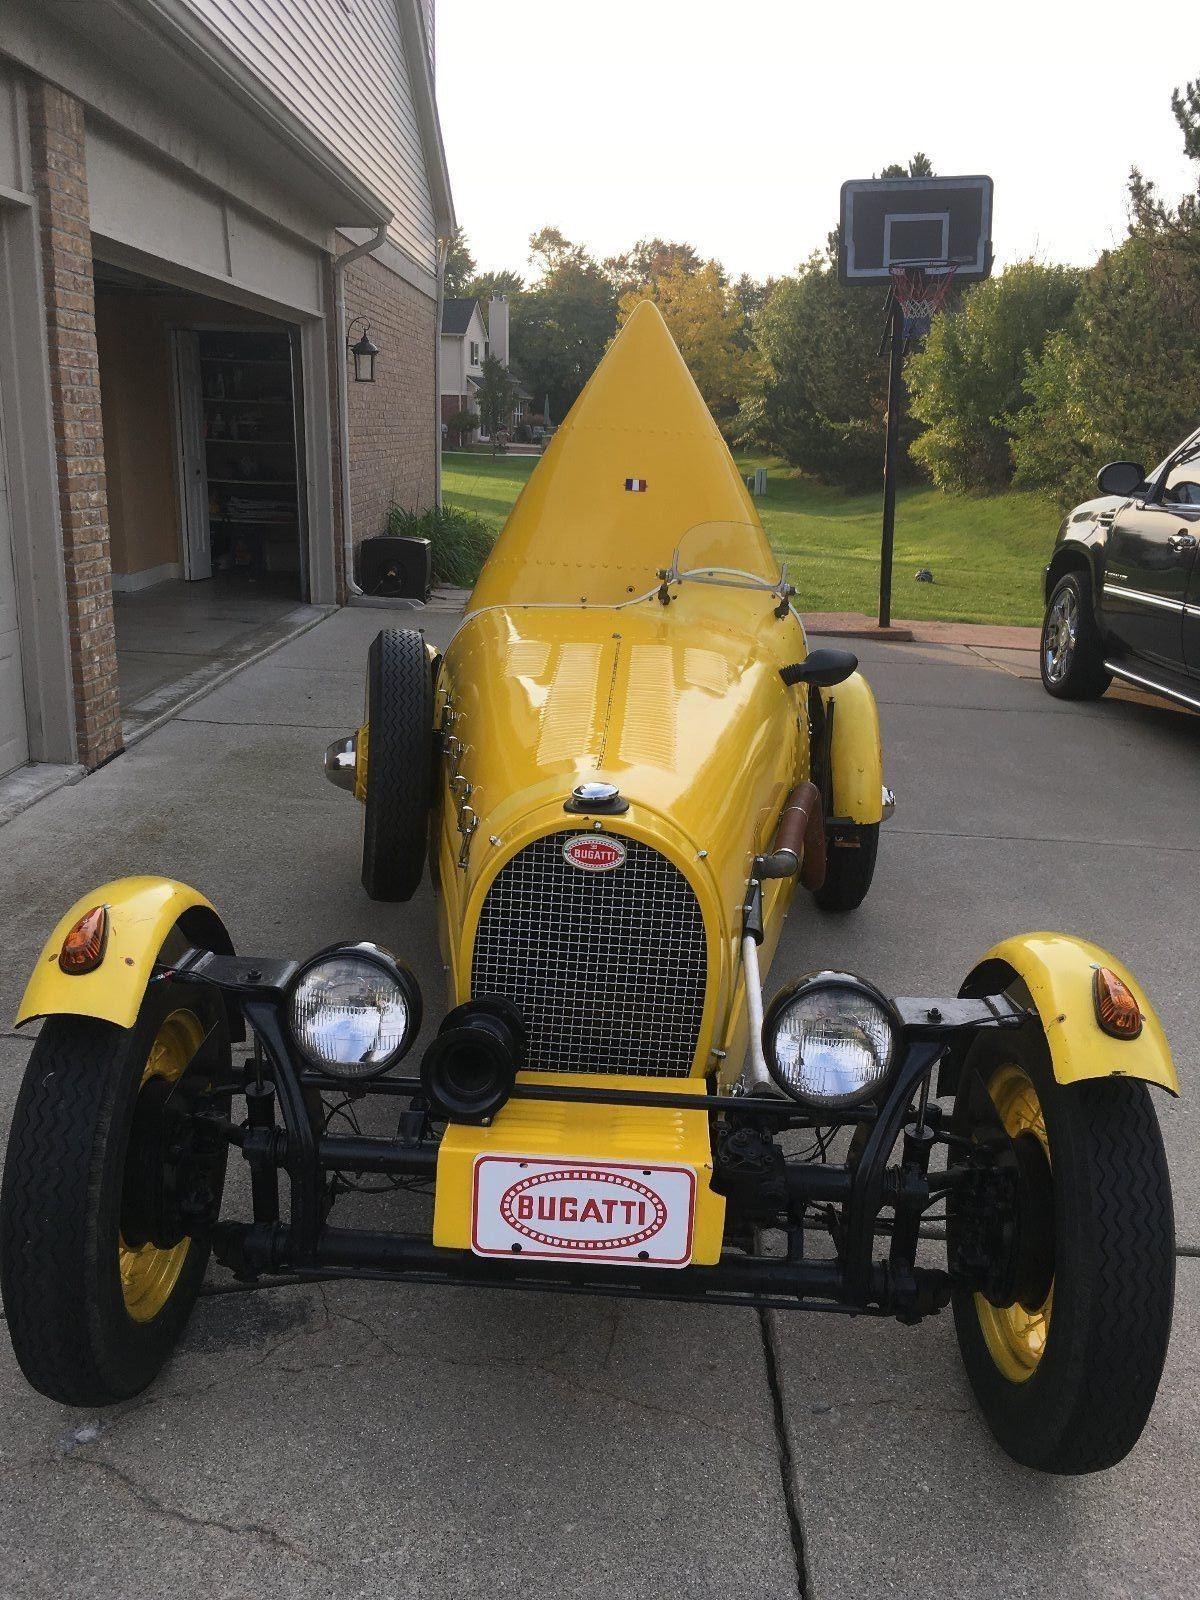 Bugatti kit car for sale